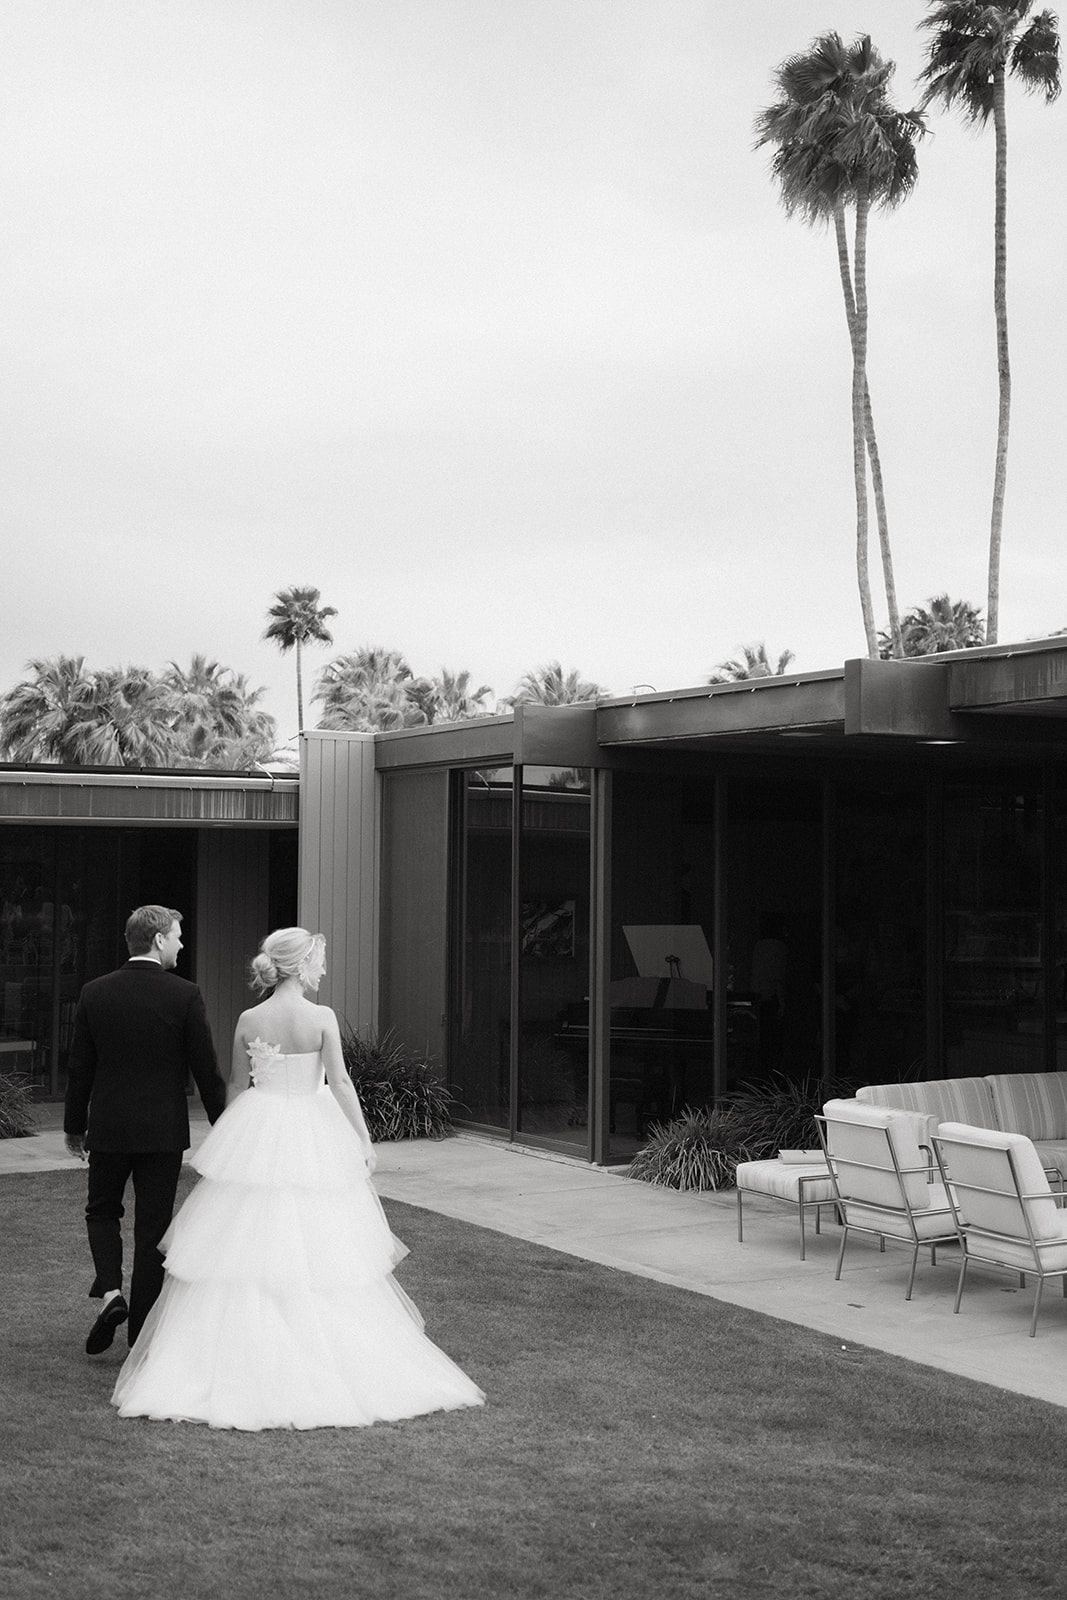 KL_WEDDING_0478.jpg